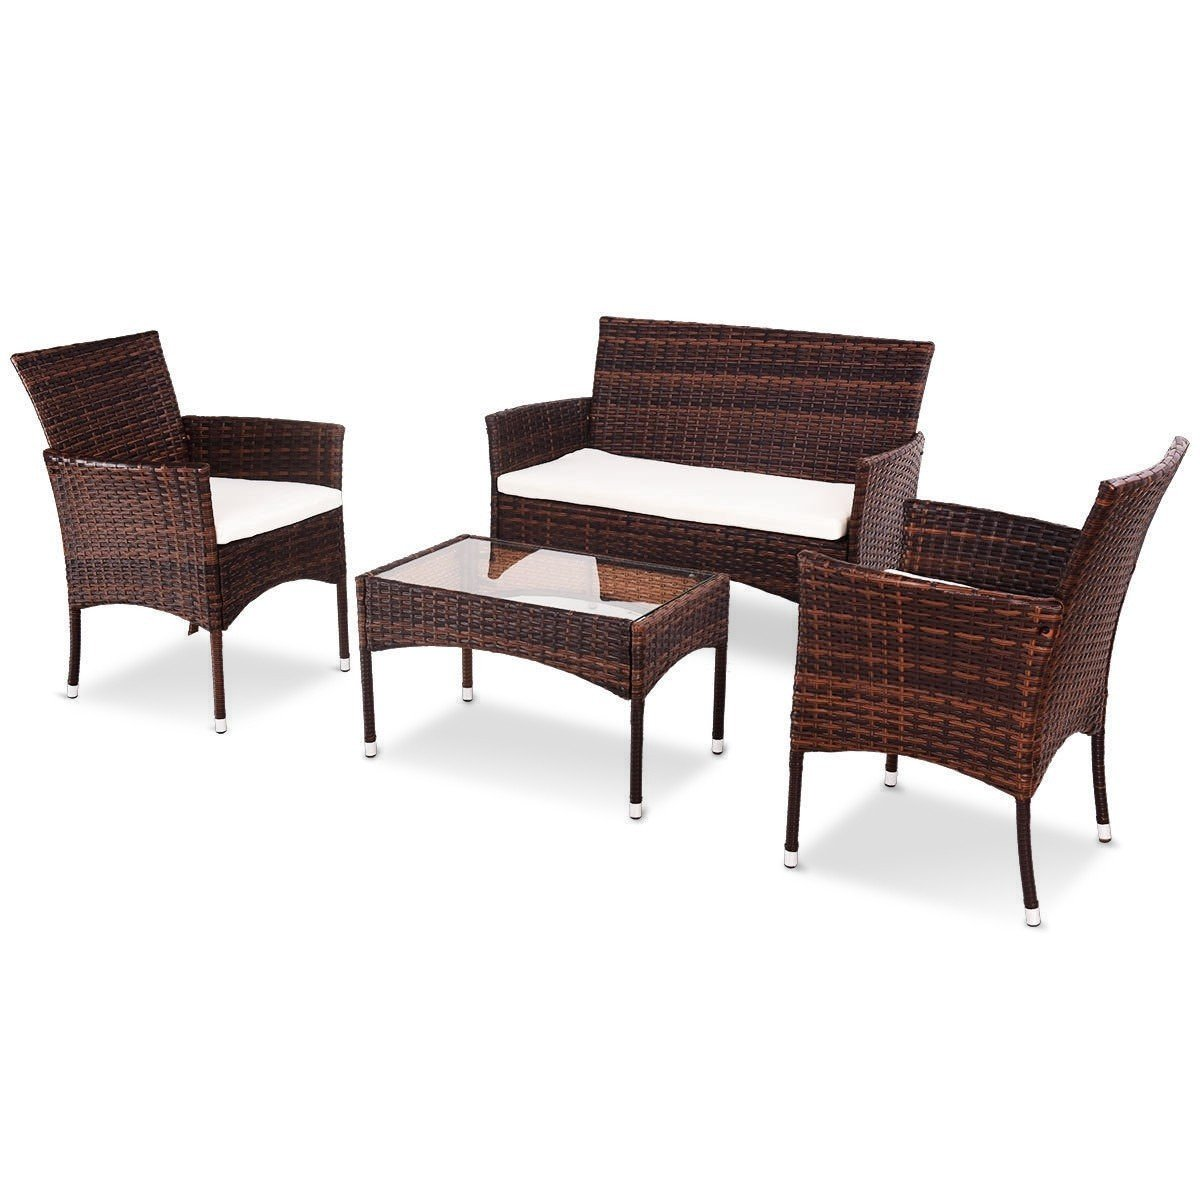 EnjoyShop 4 Pcs PE Rattan Wicker Table Shelf Sofa Furniture Set with Cushion Dining Garden Picnic Outdoor by EnjoyShop (Image #1)